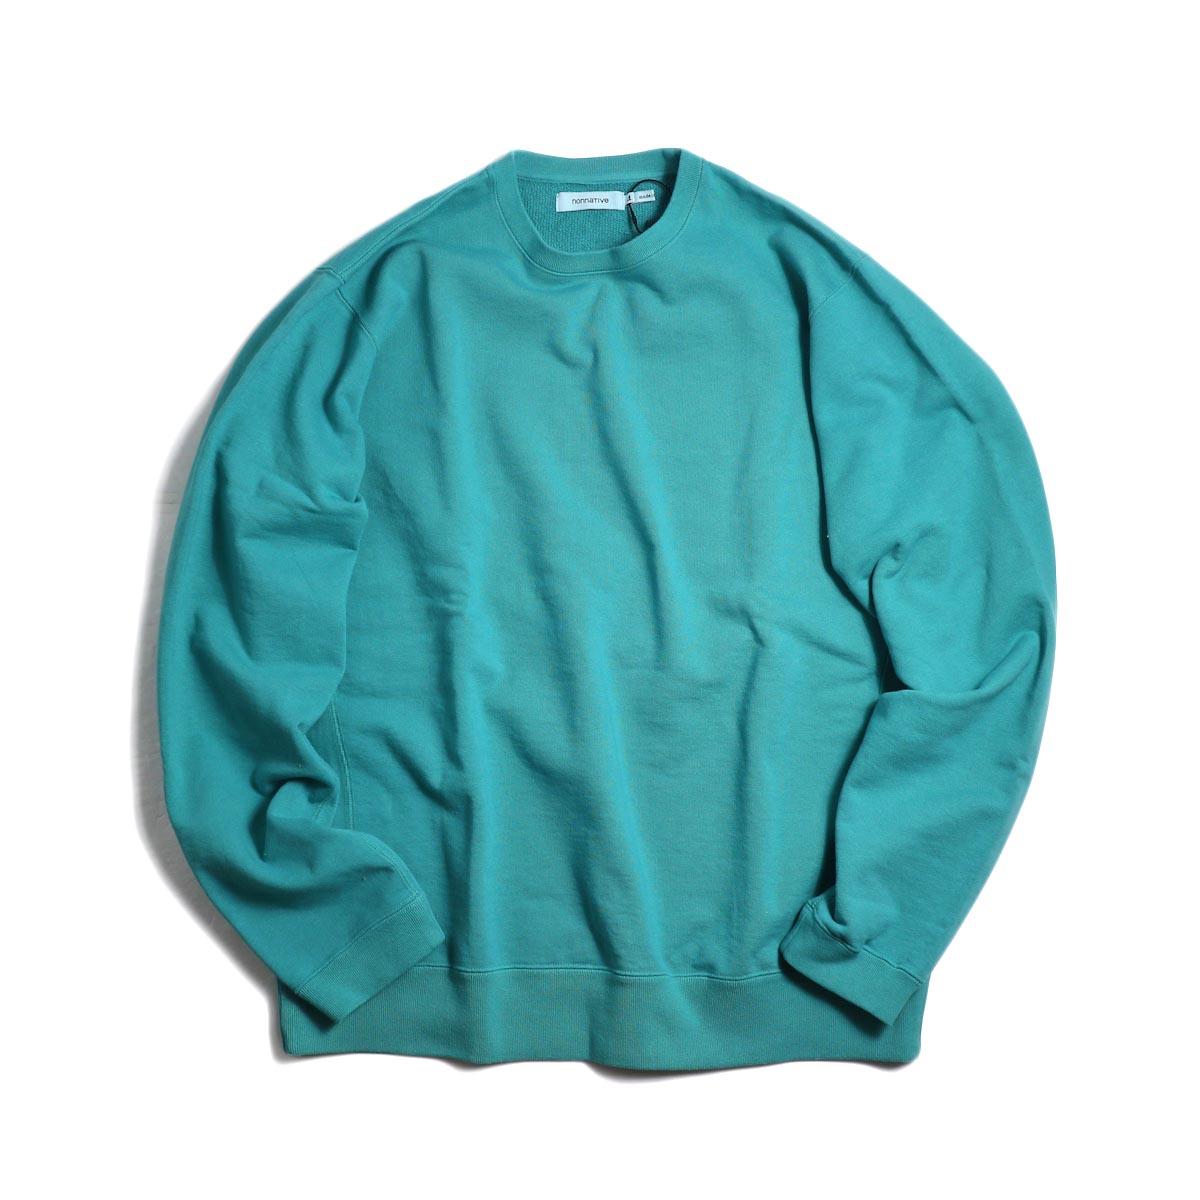 nonnative / COACH CREW PULLOVER COTTON SWEAT OVERDYED -Emerald